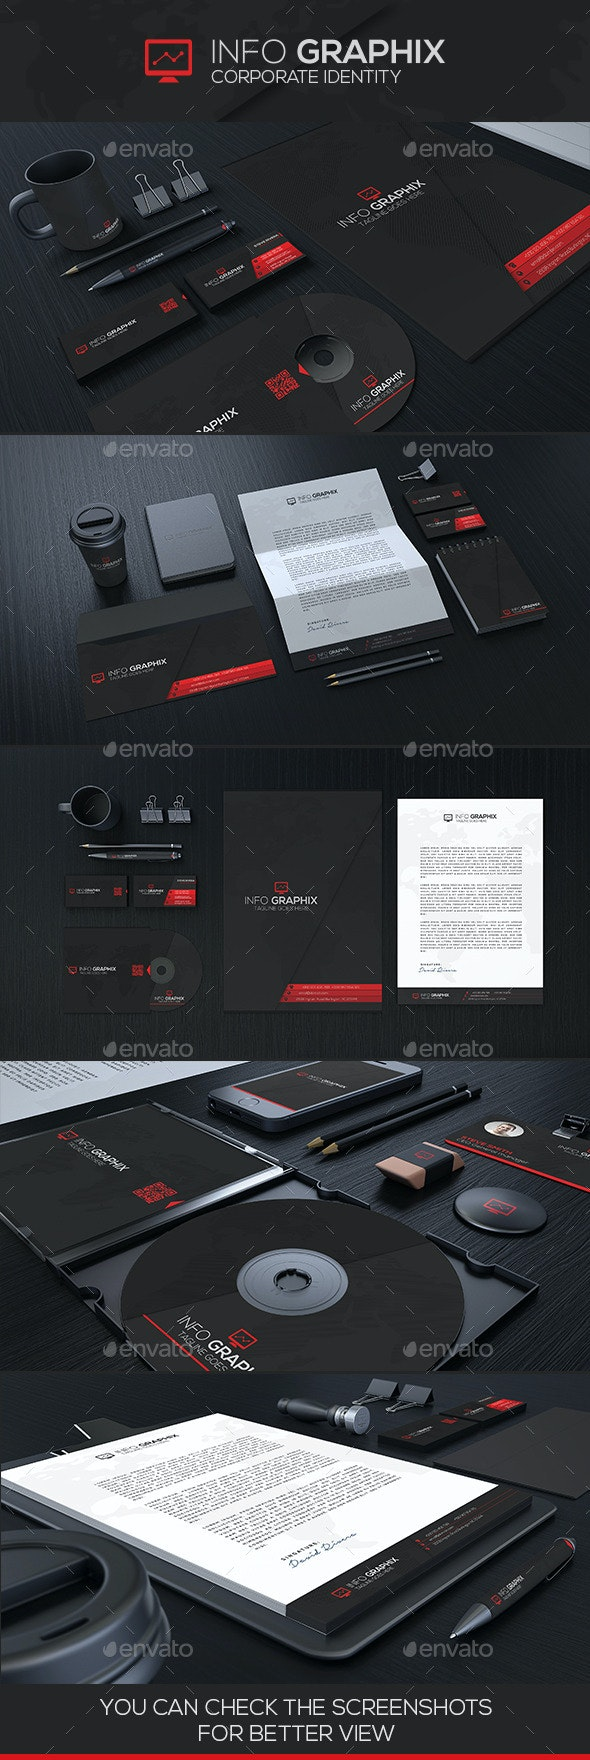 InfoGraphix Corporate Idenity - Stationery Print Templates